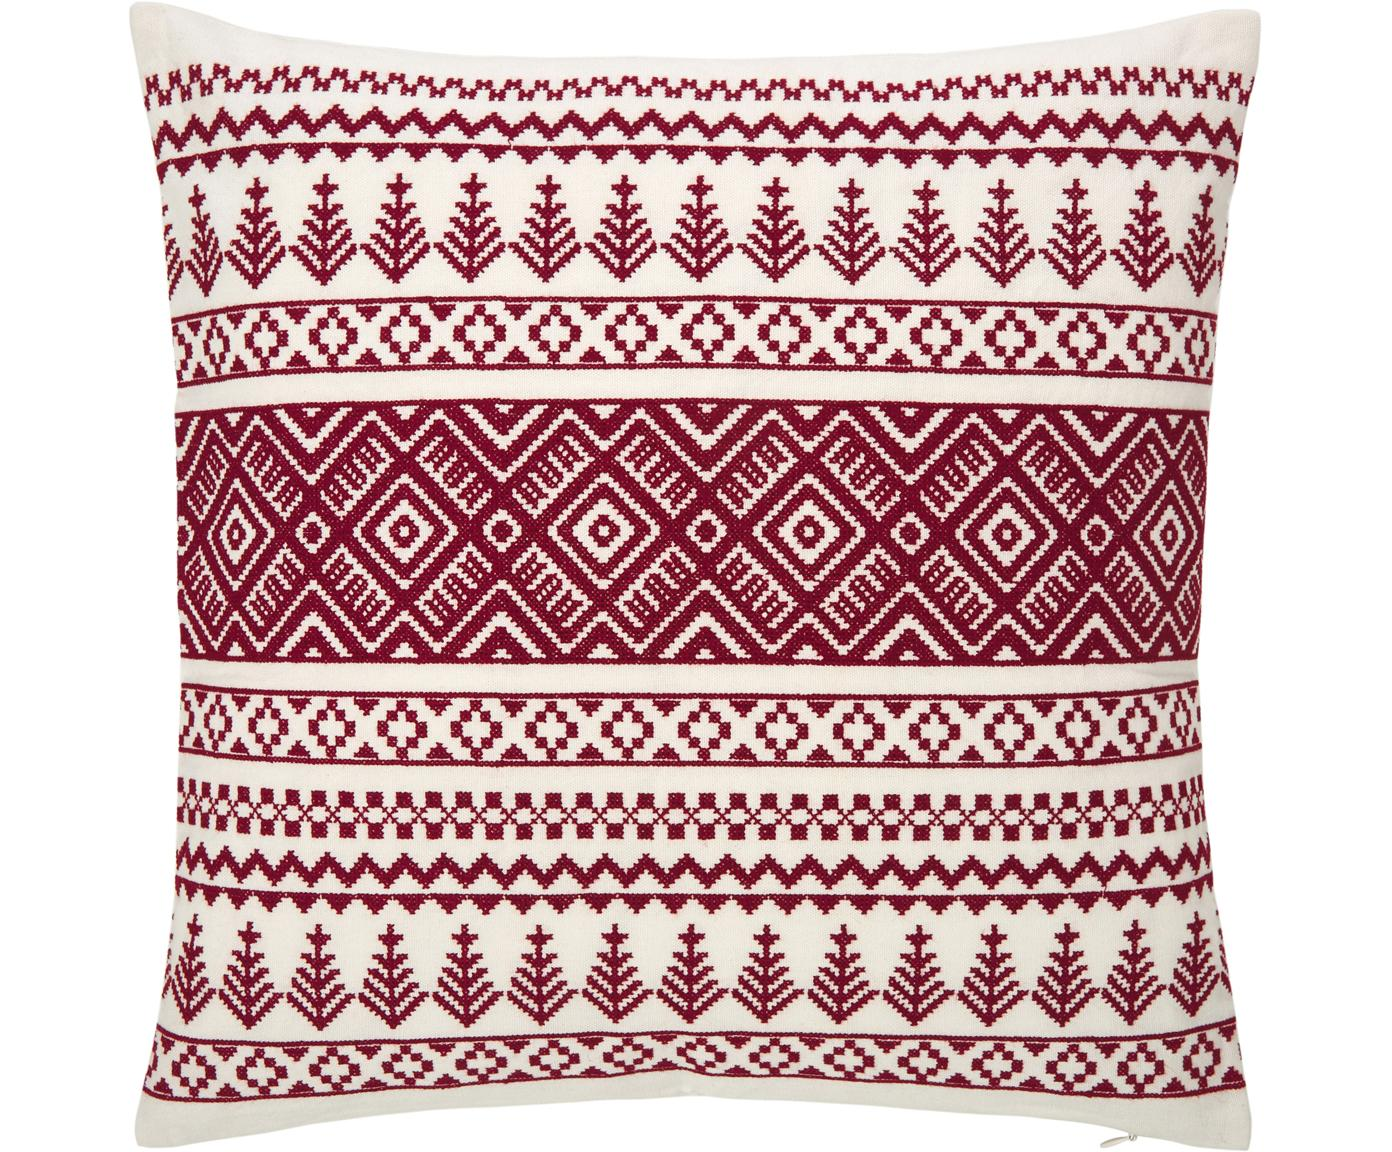 Funda de cojín Islay, 100%algodón, Rojo, blanco crema, Cama 180/200 cm (260 x 220 cm)